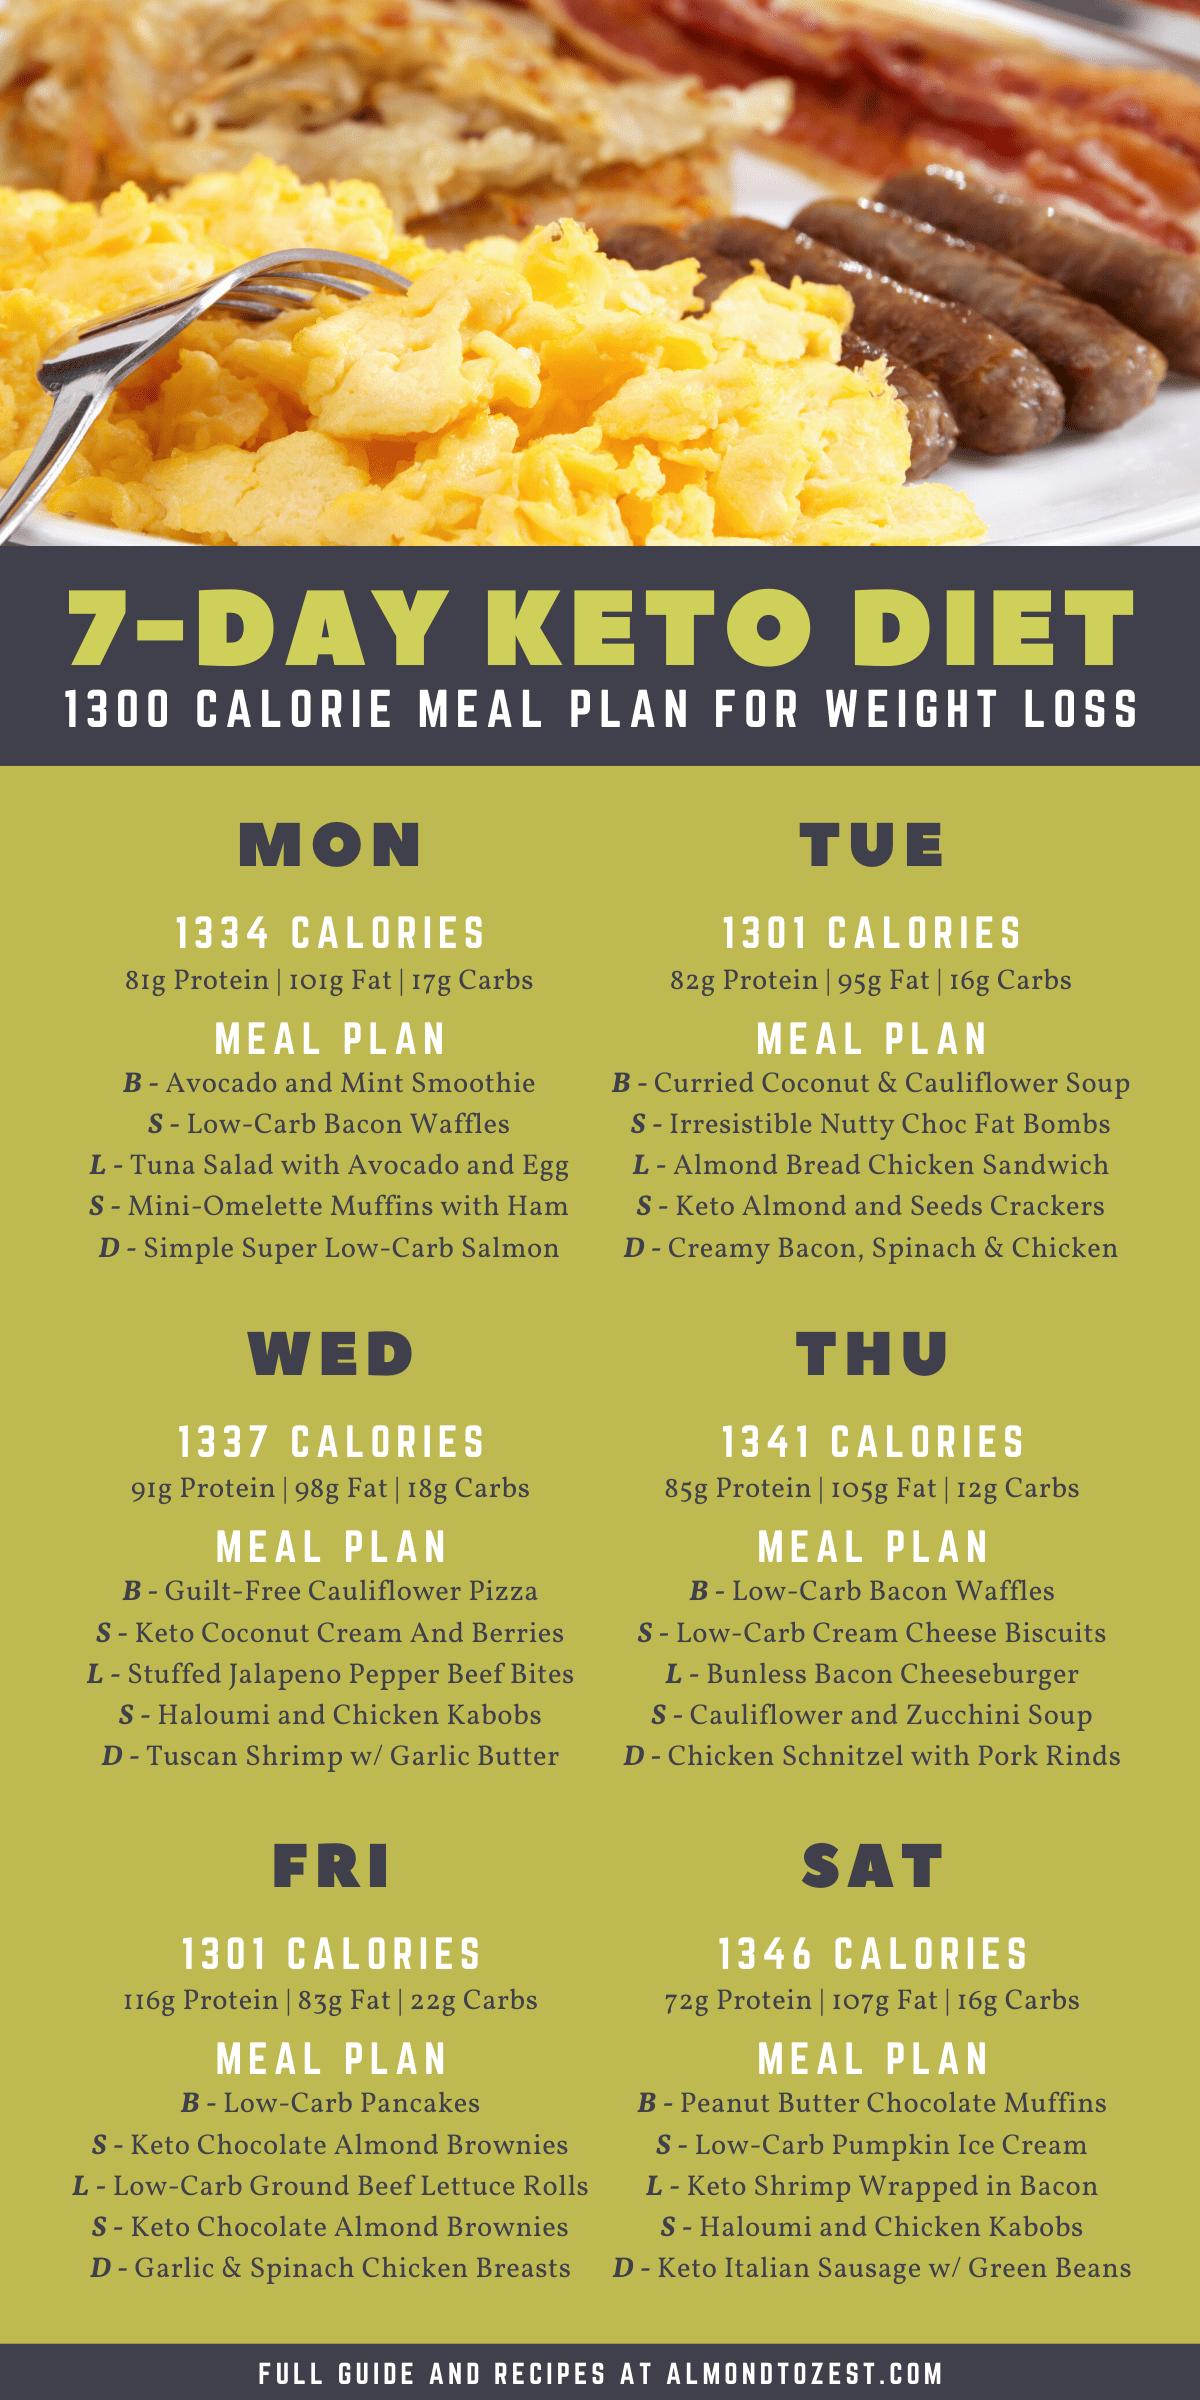 Keto Meal Plan: 7-Day Keto Diet Menu for Beginners in 2020 ...